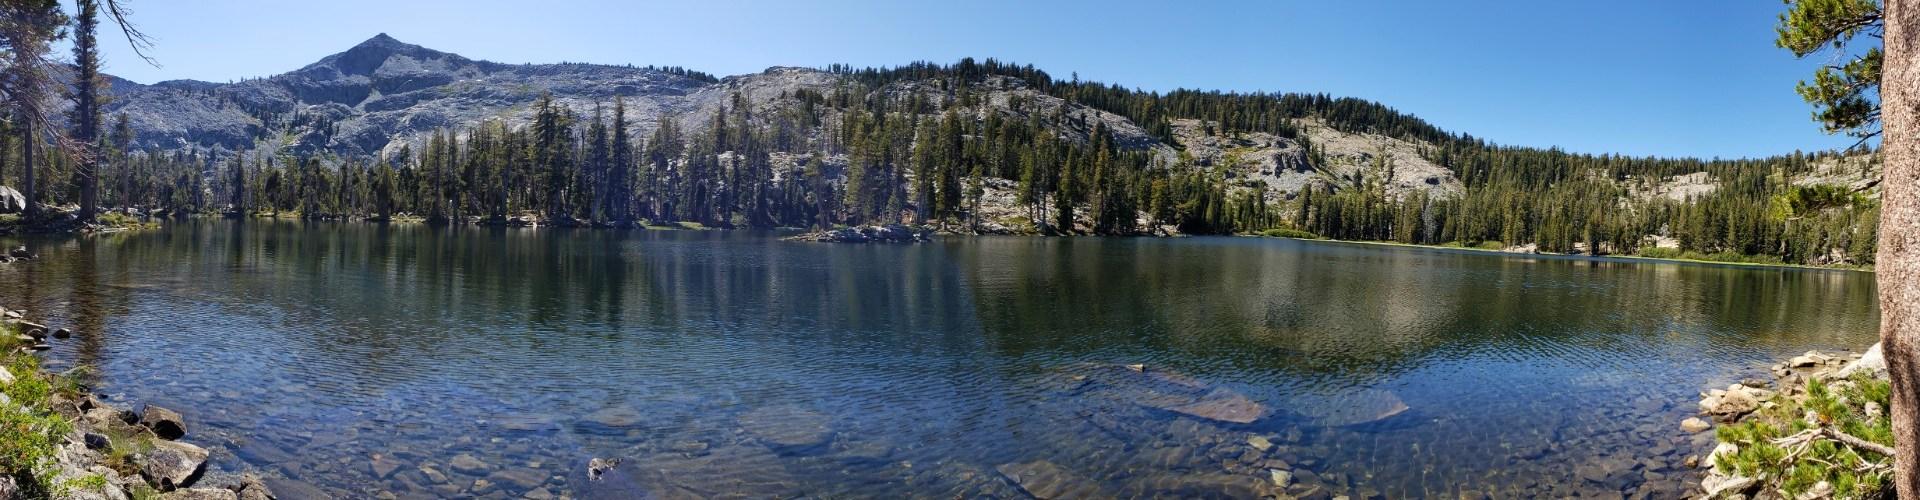 Tamarack Lake Desolation wilderness